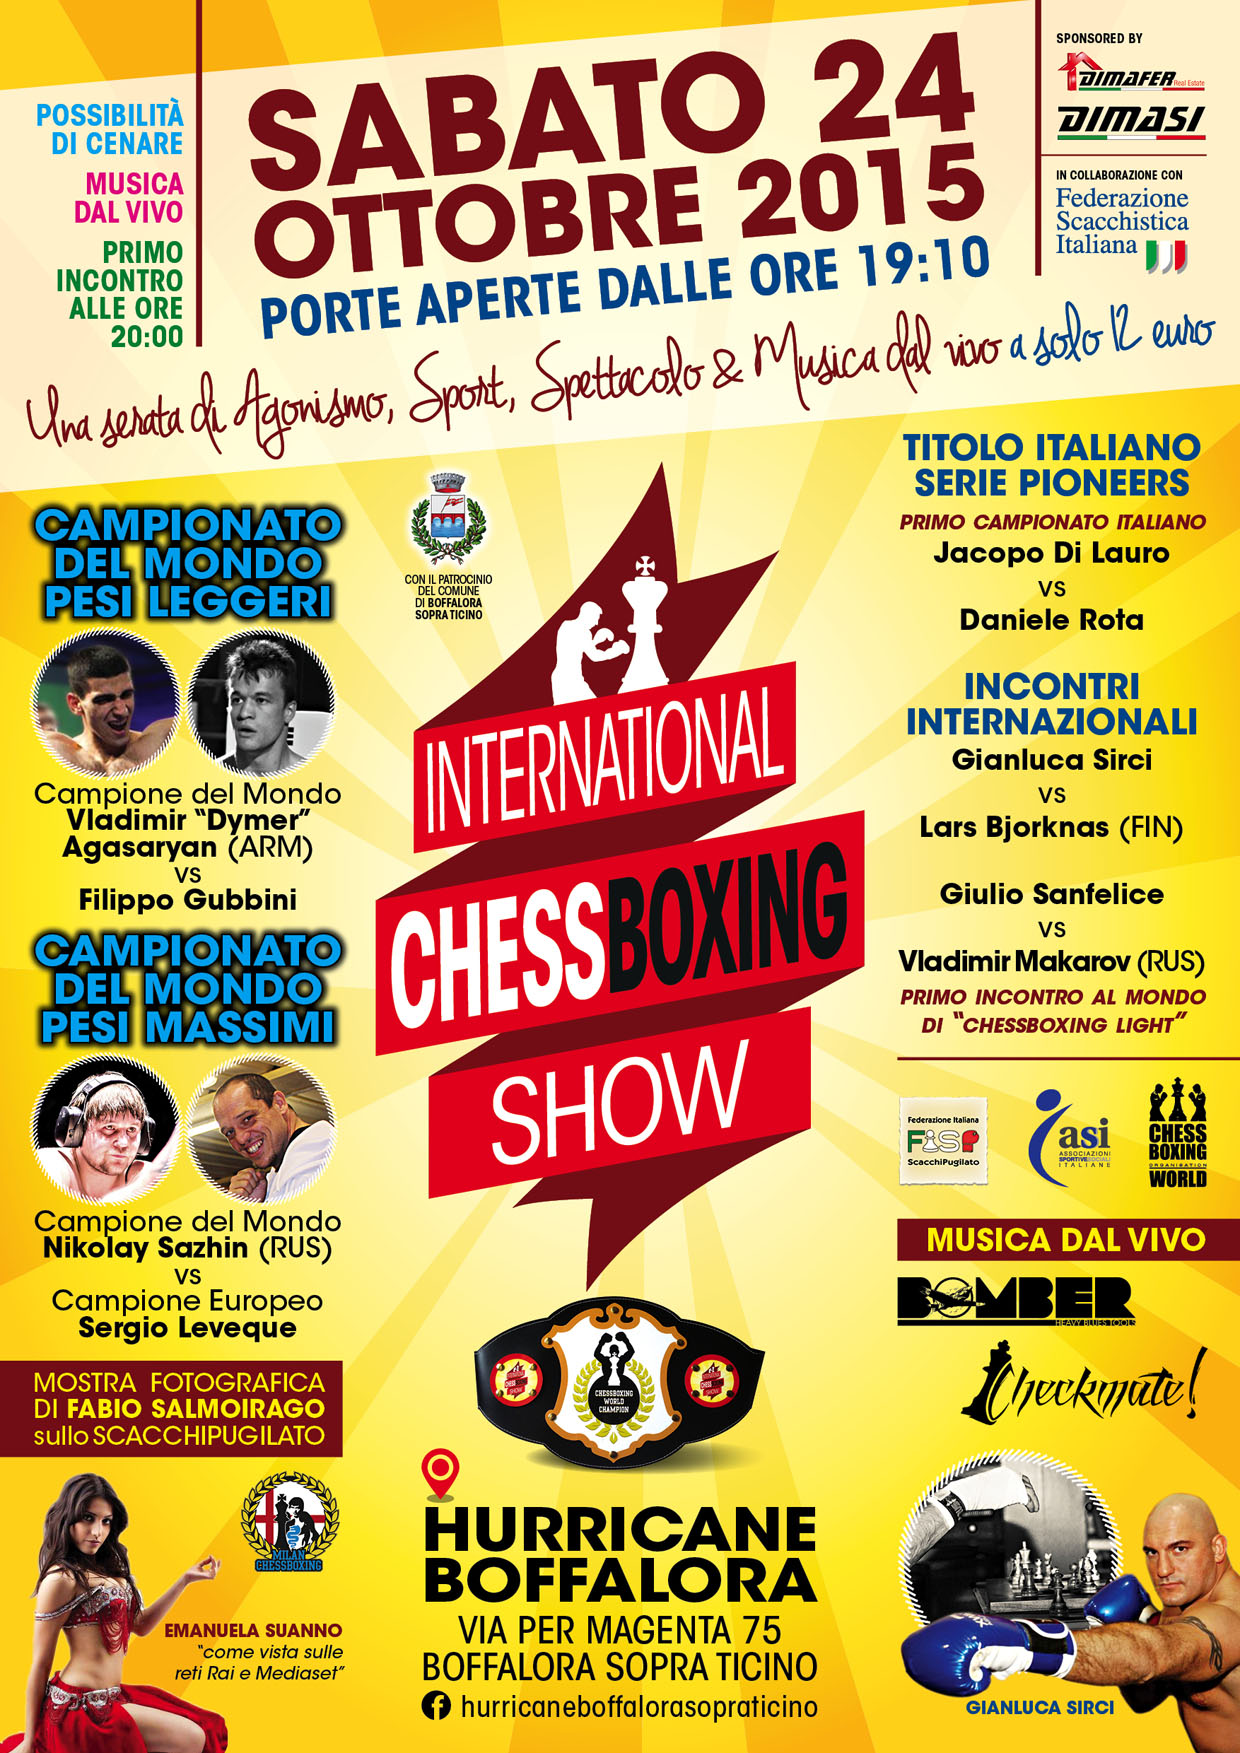 International Chessboxing Show: video promozionale.